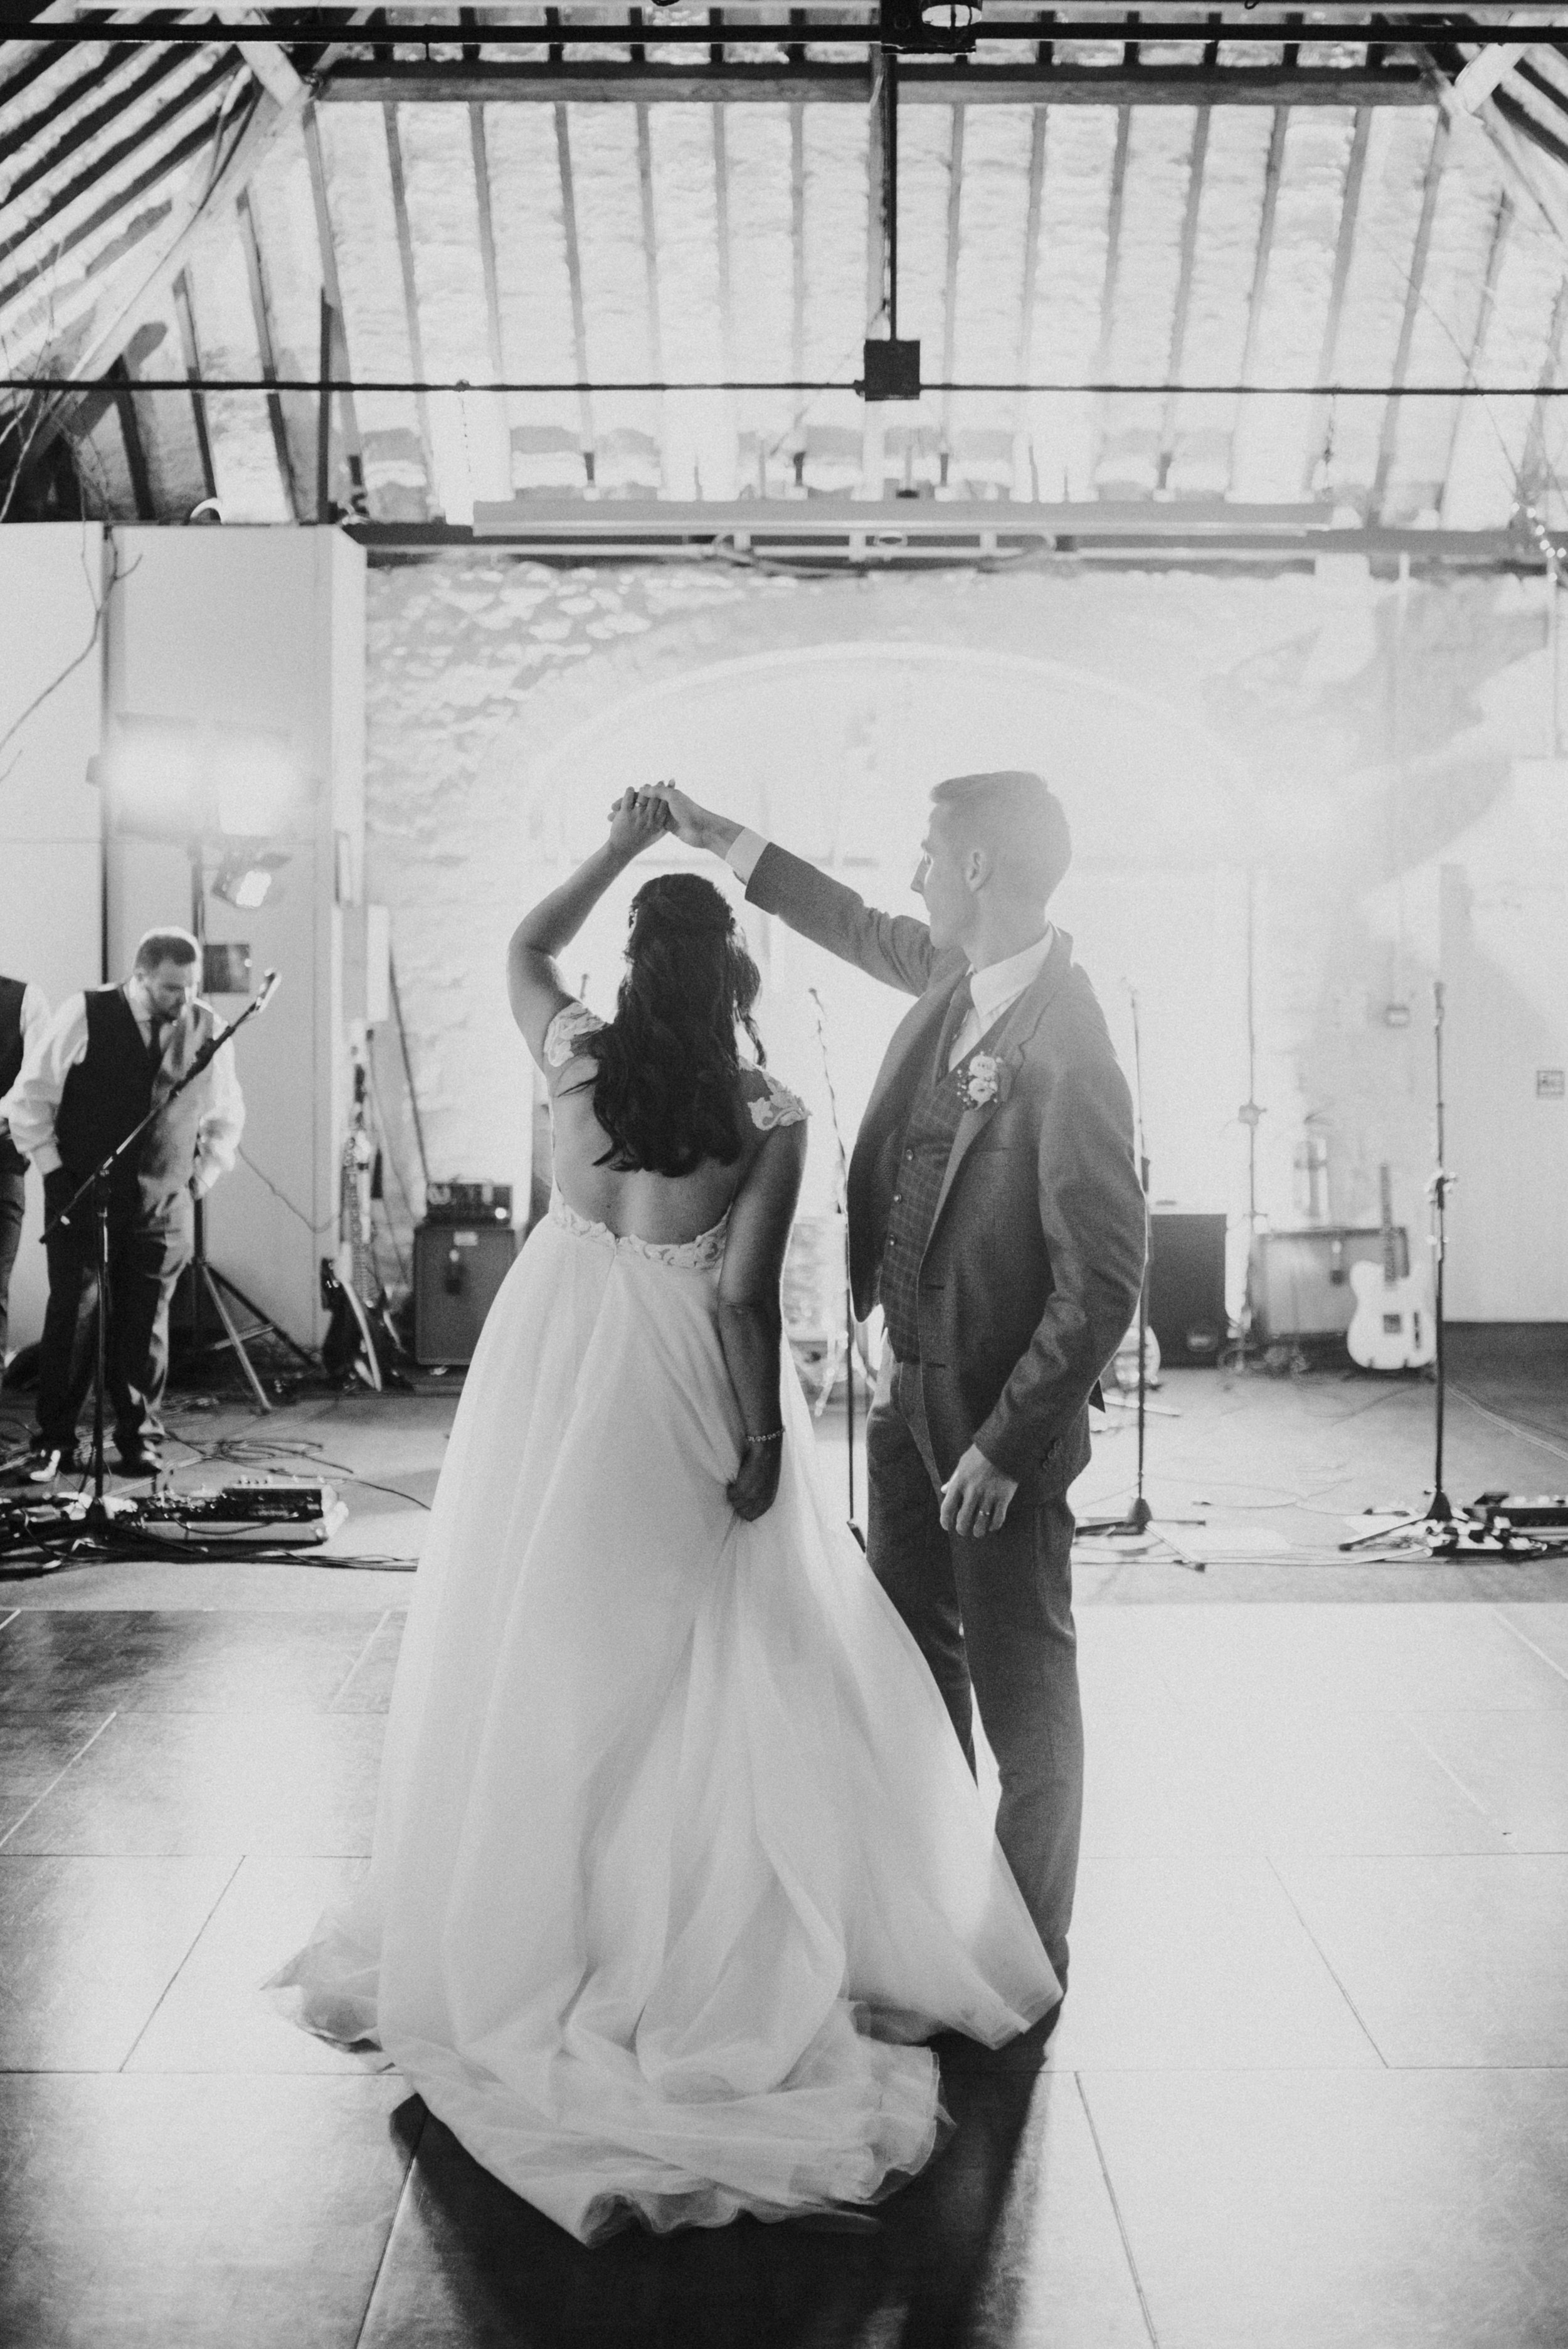 larchfield estate wedding, wedding venues northern ireland, barn wedding venues northern ireland, wedding photos larchfield estate, shane todd wedding, irish wedding, first dance (5).jpg